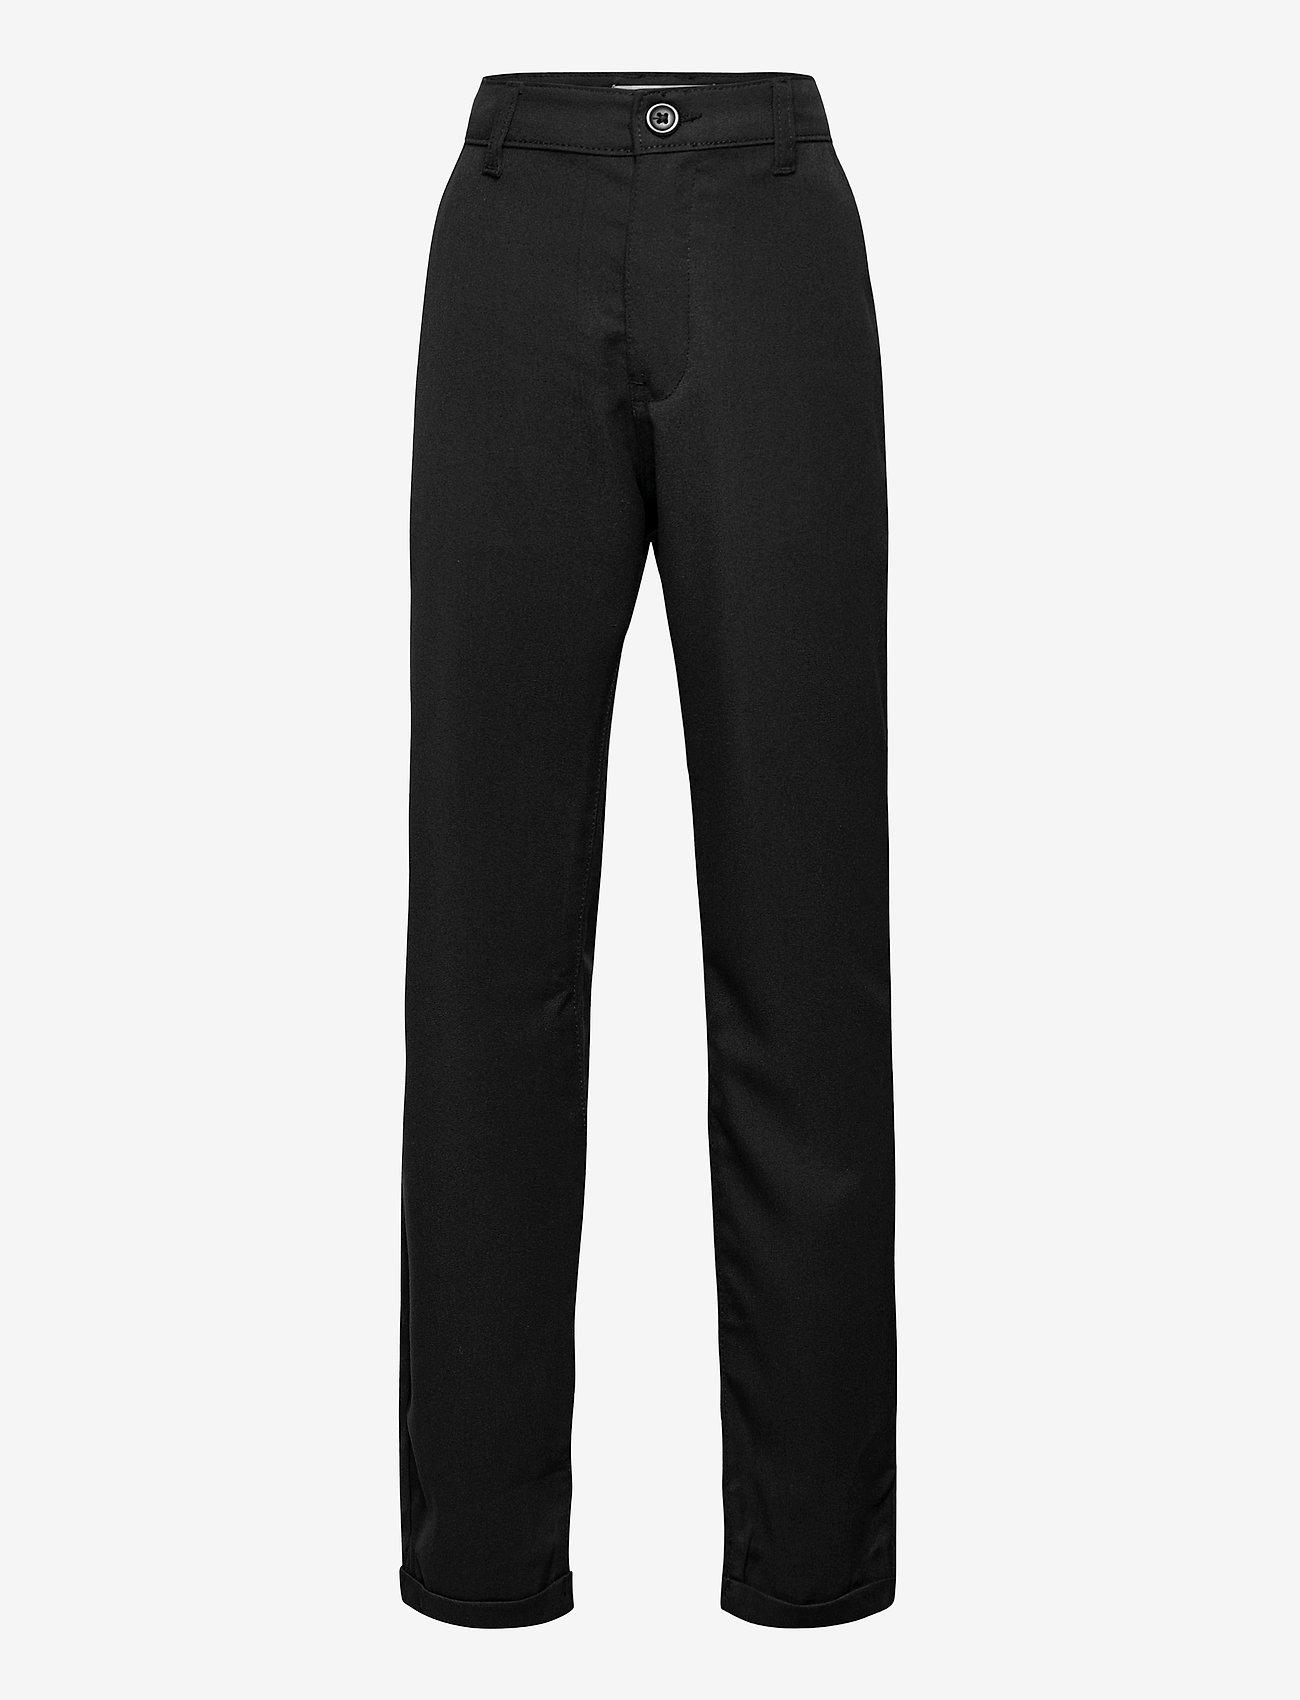 Costbart - CHRINS CHINNO CROPPED PANTR - pantalons - black - 0